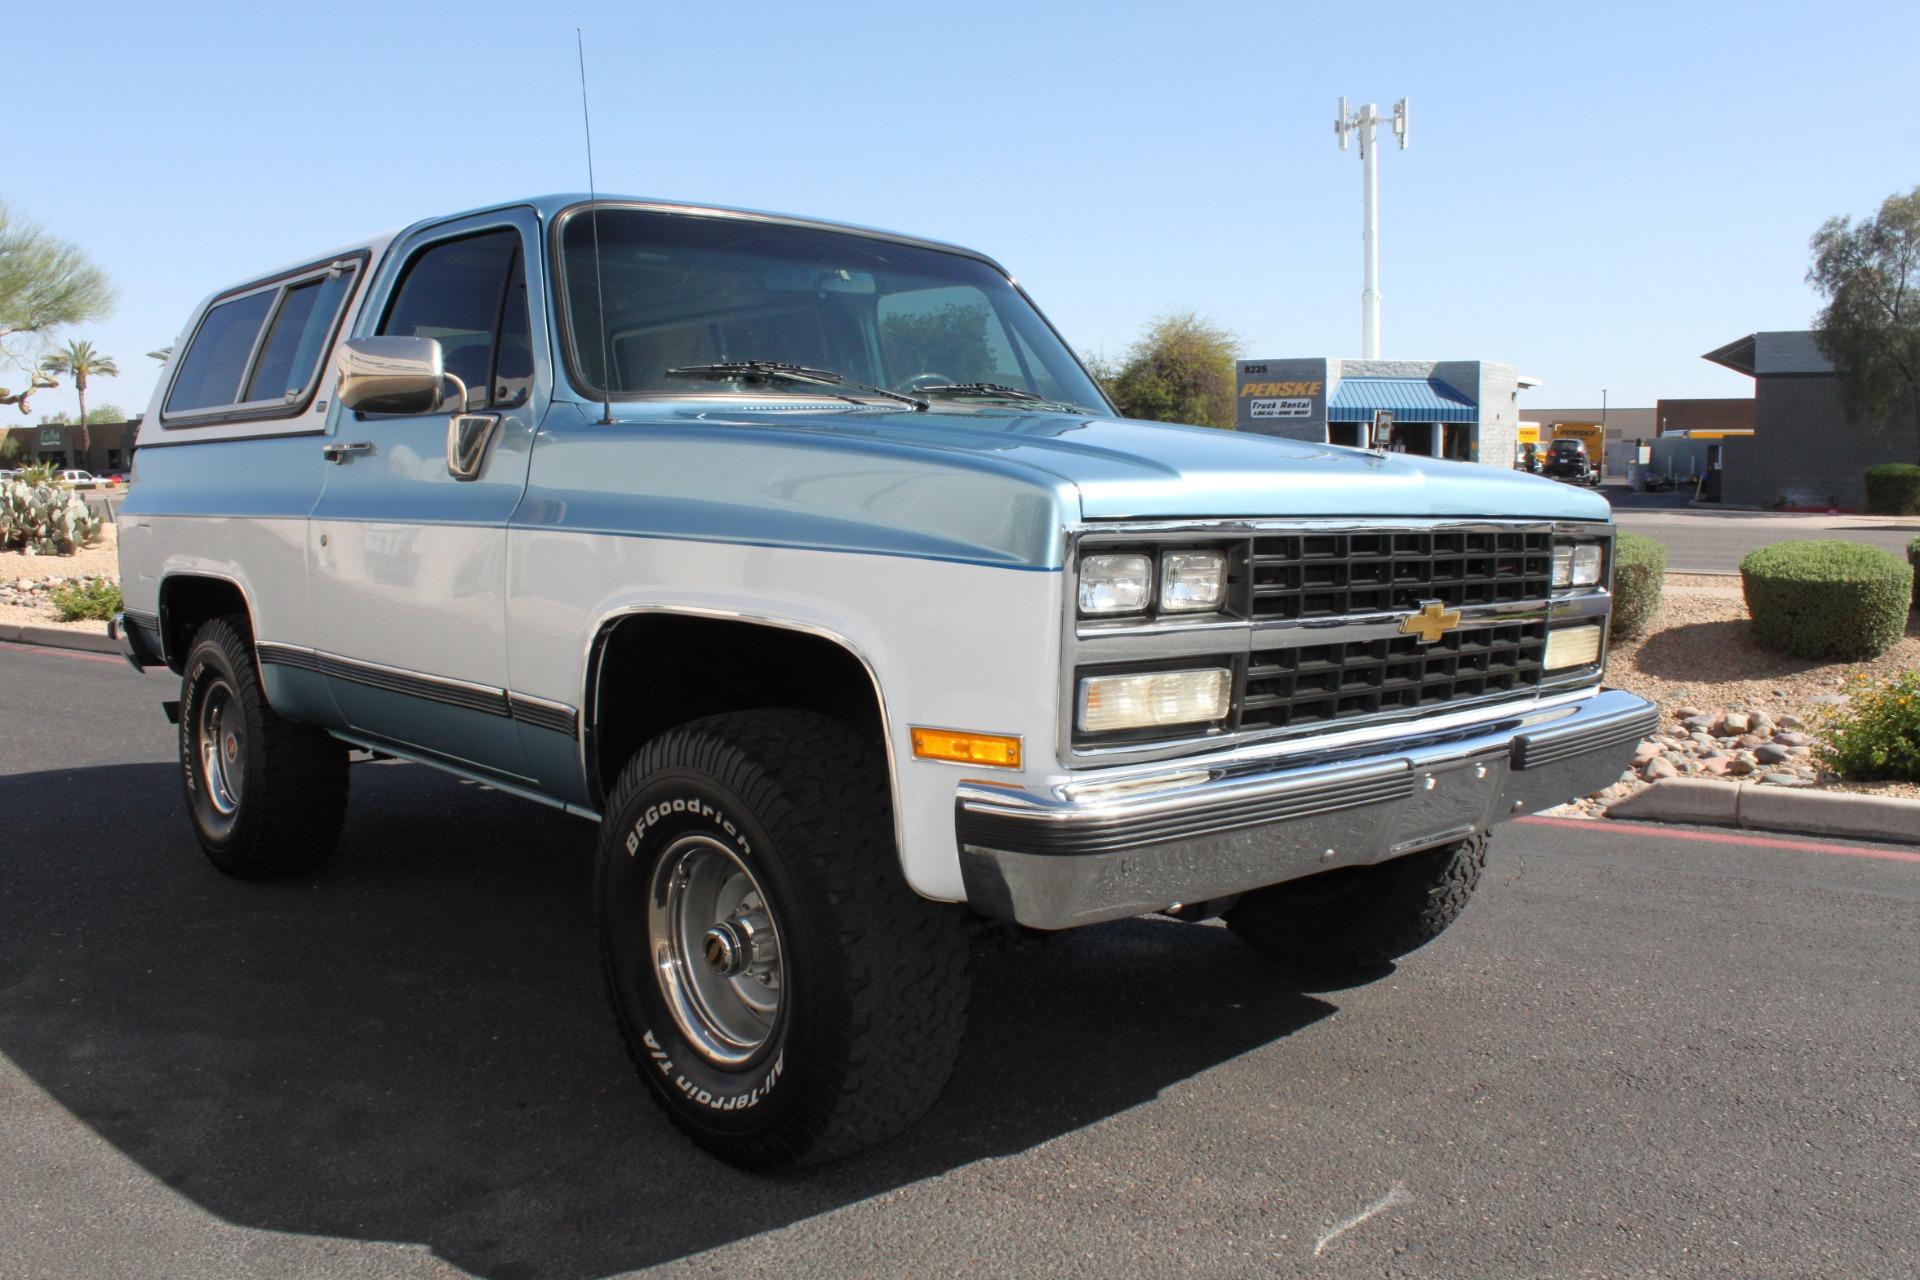 Used-1989-Chevrolet-K5-Blazer-4X4-Mercedes-Benz